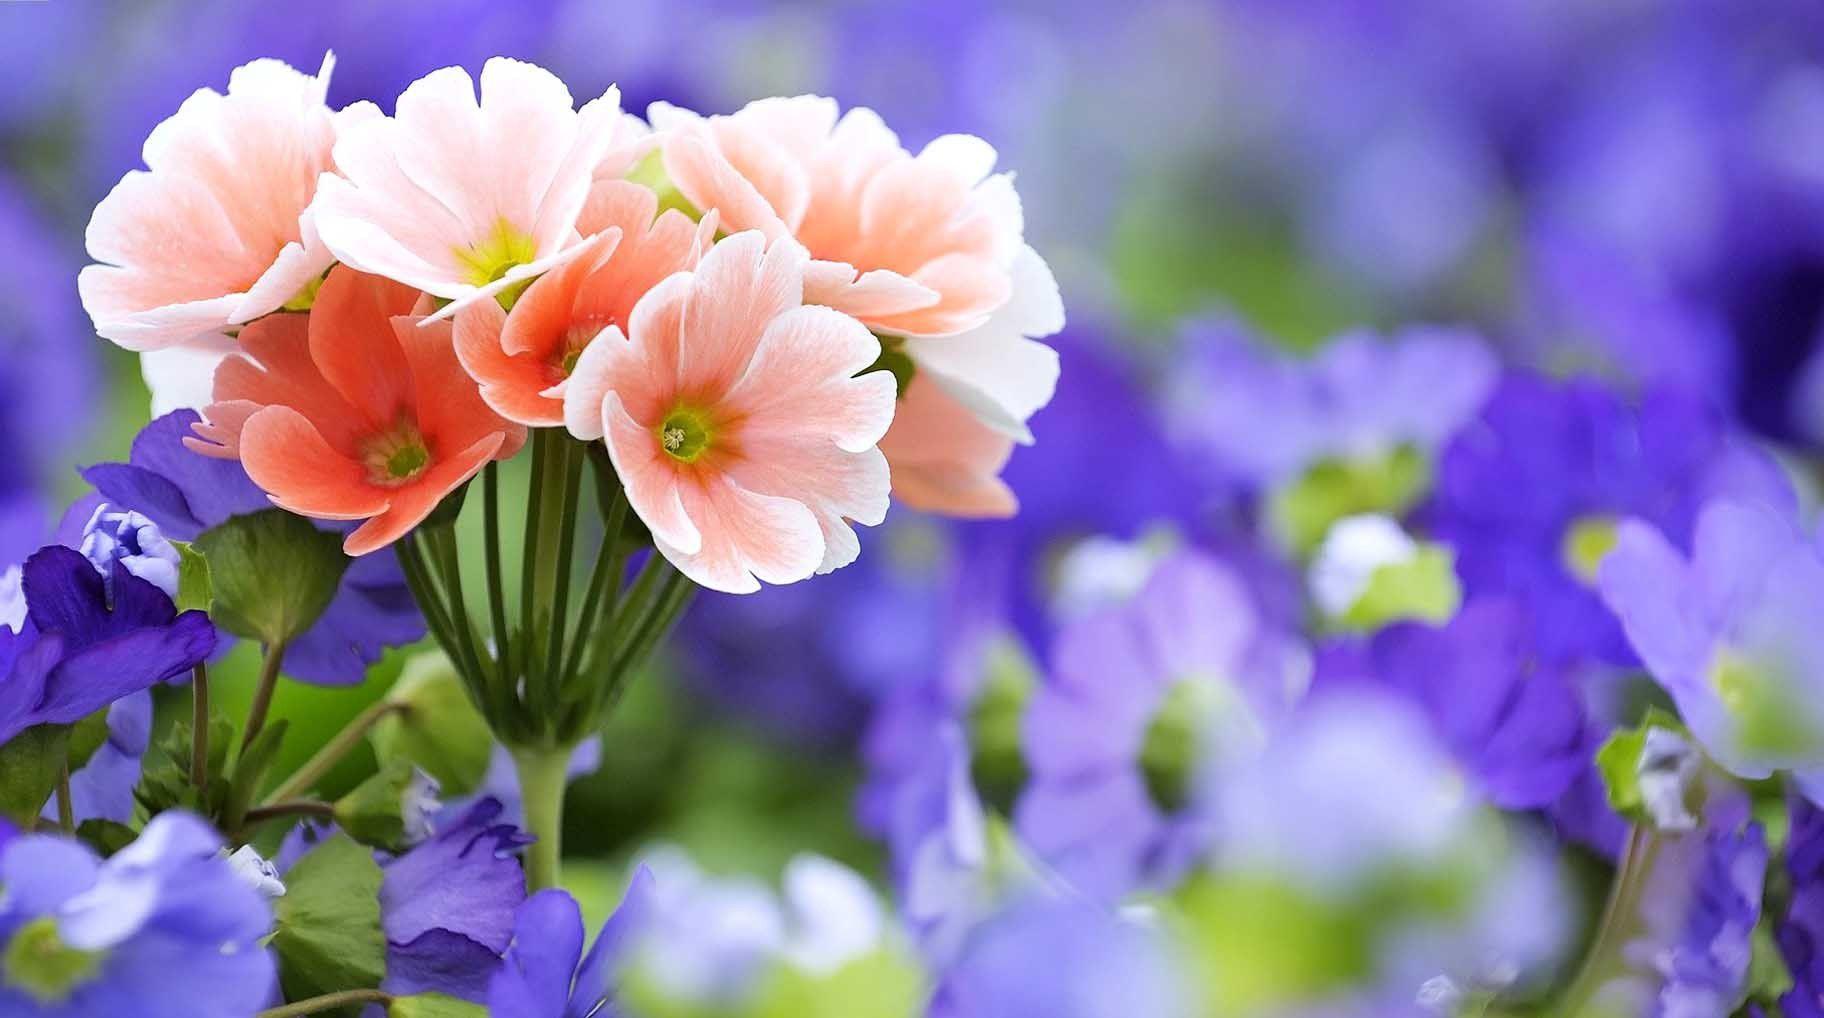 Flower wallpaper free download for mobile flower wallpaper flower wallpaper free download for mobile dhlflorist Images